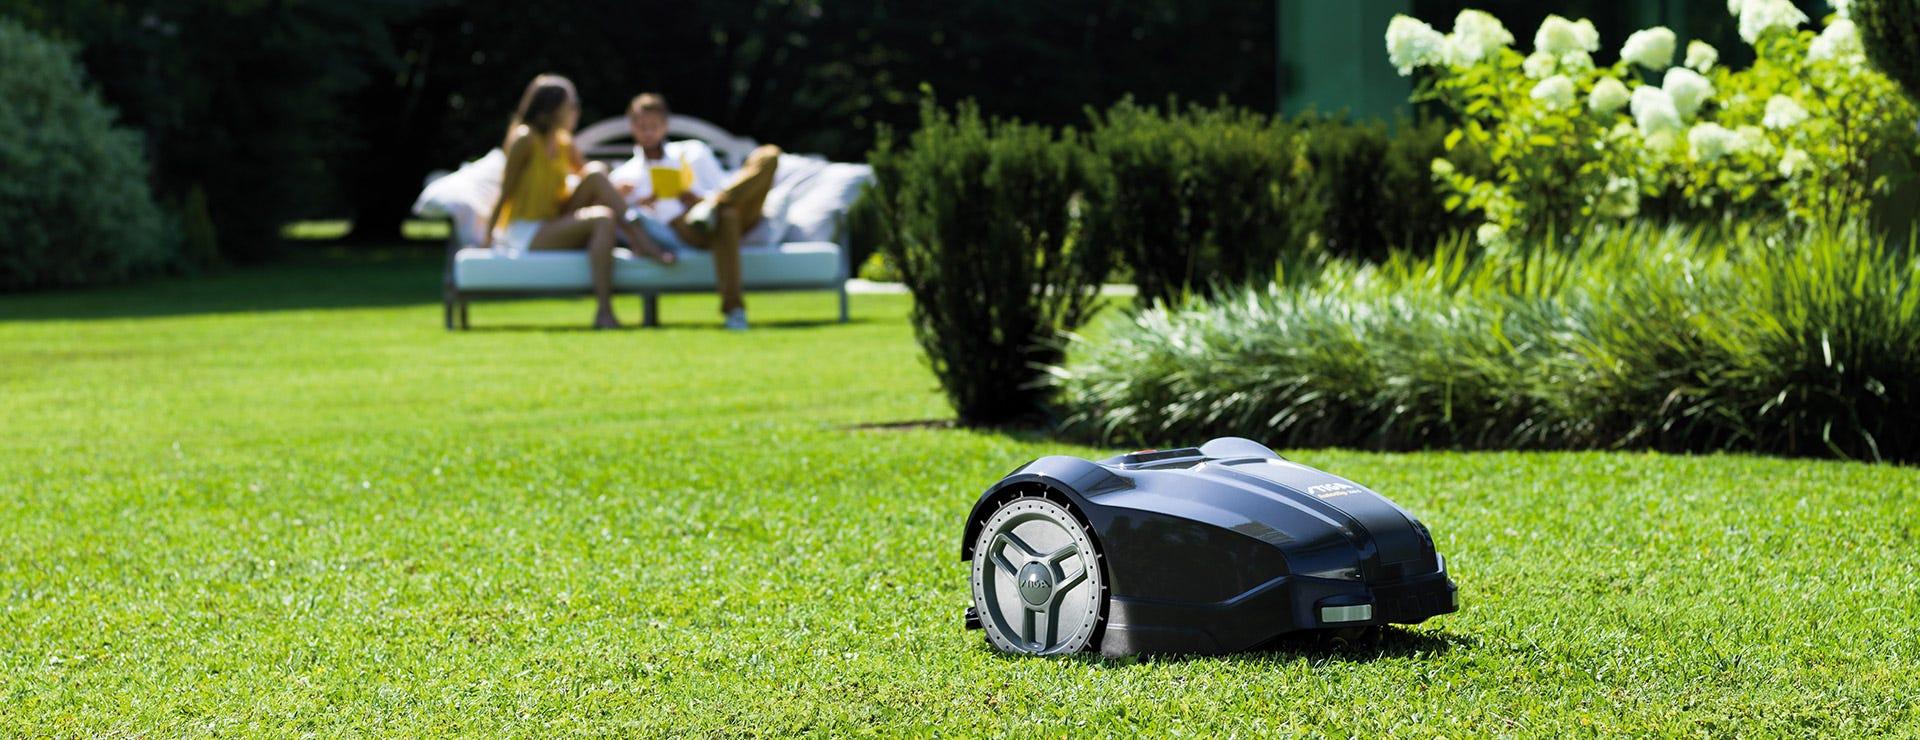 autoclip robot mowers perfect lawn